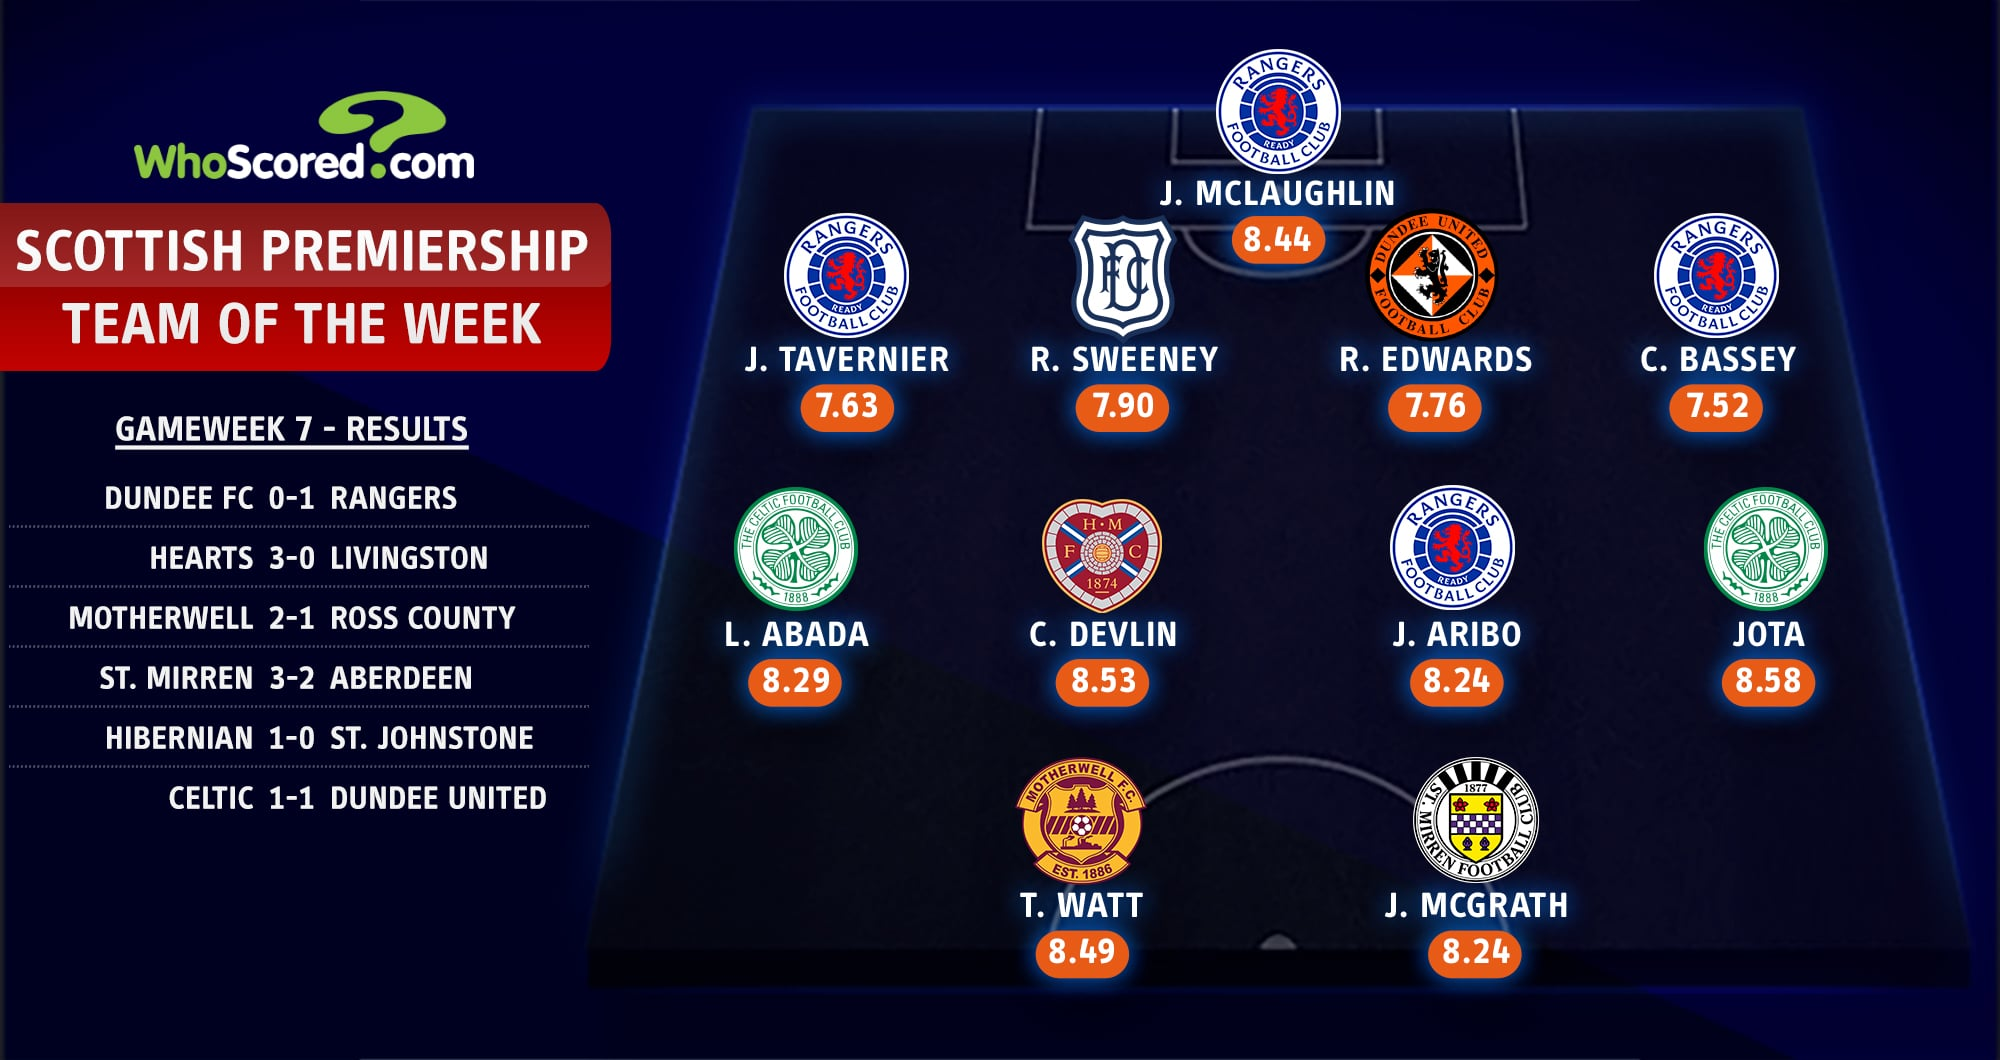 Aribo Makes Scottish Premiership Team Of The Week